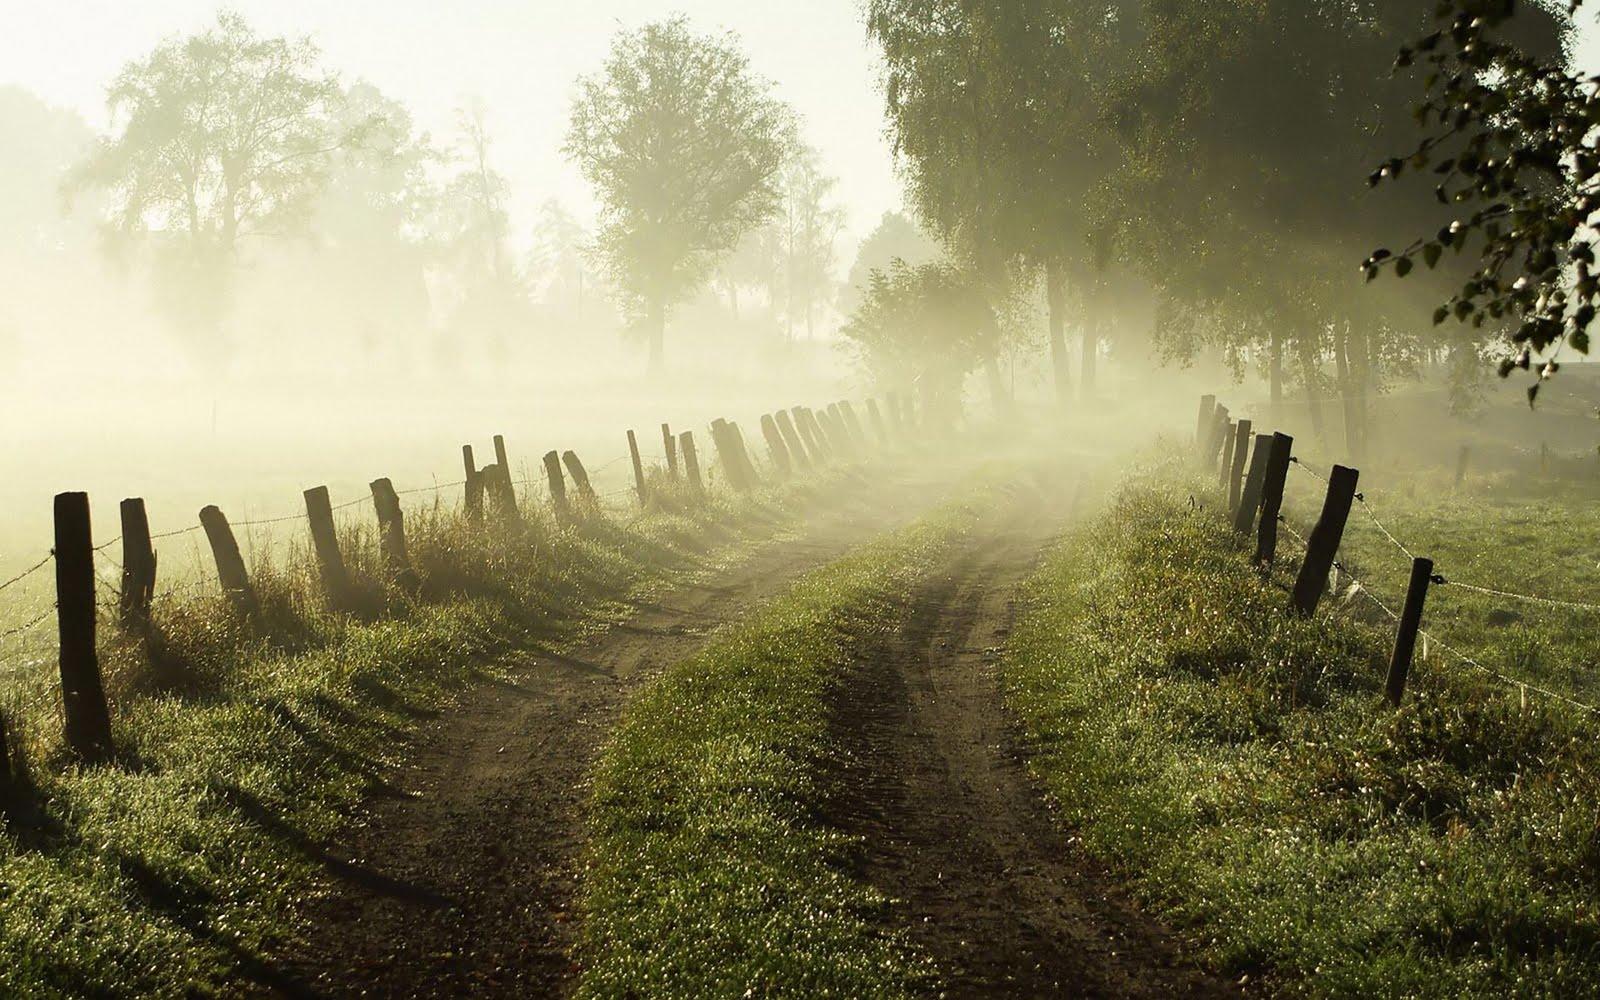 Morning Fog Desktop Wallpaper hd wallpaper - Beauty O'v NaTuRe ....... !!!!!!!!